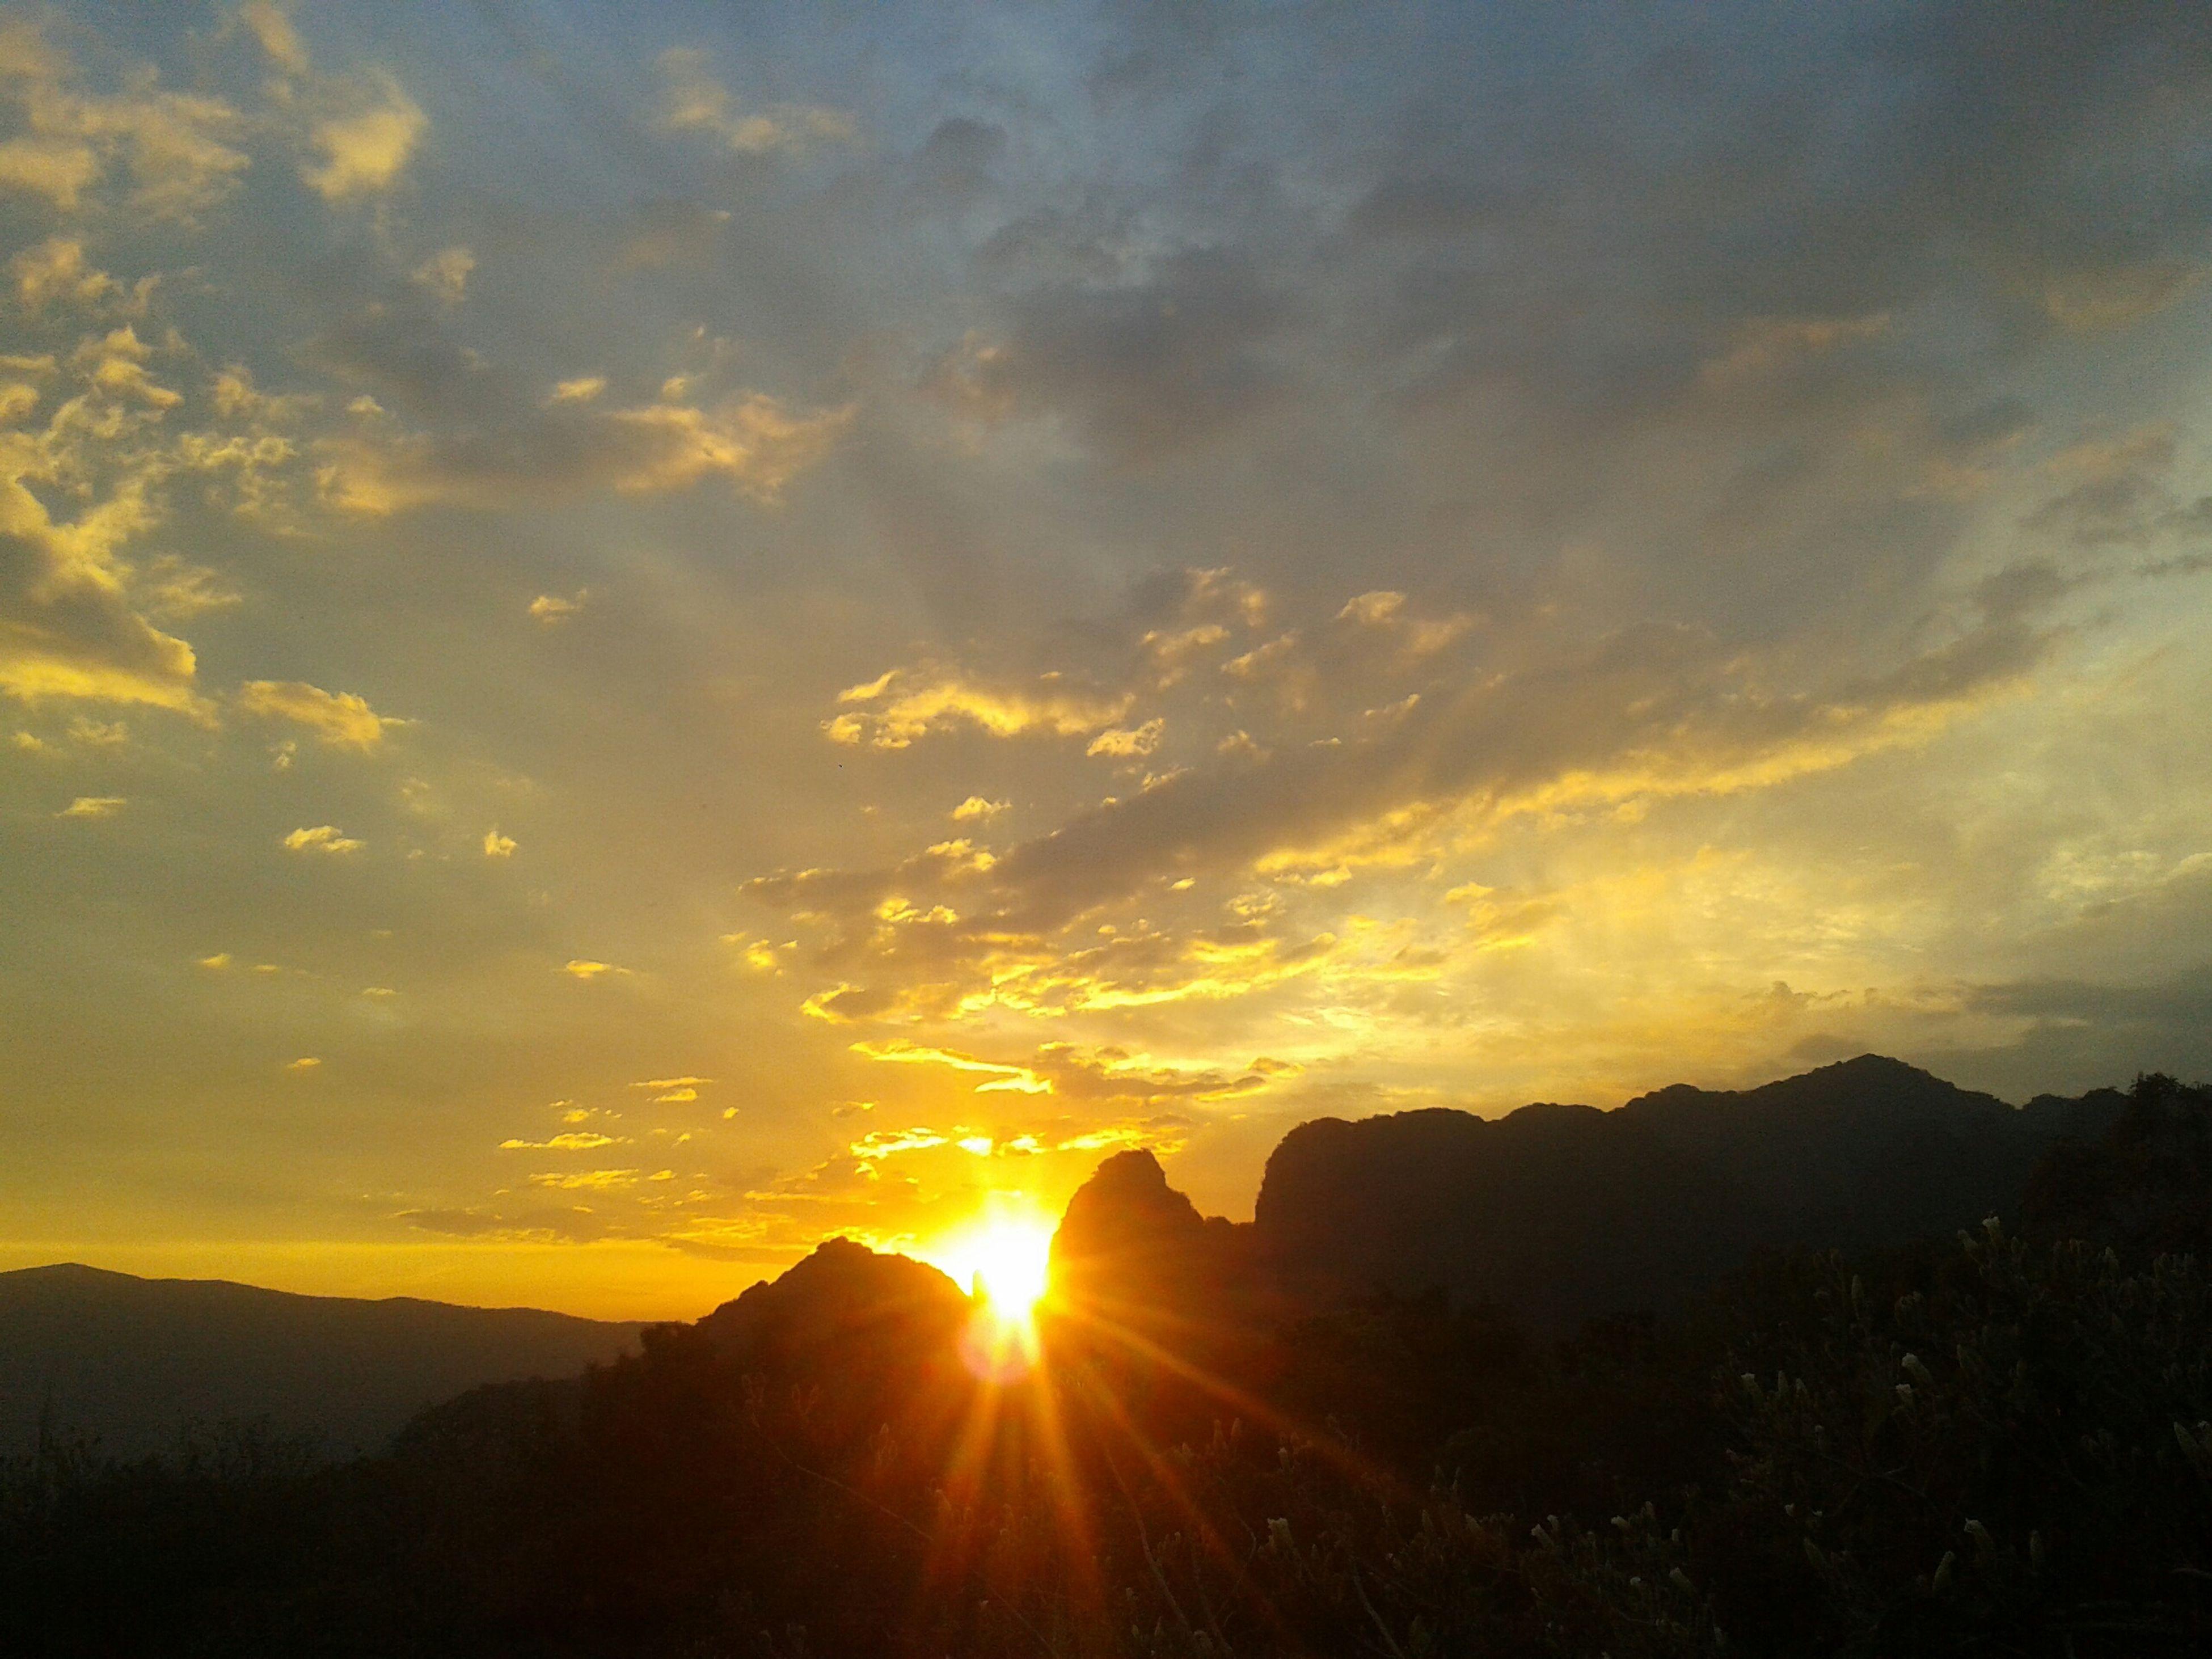 sunset, sun, scenics, silhouette, tranquil scene, beauty in nature, sky, sunbeam, tranquility, sunlight, mountain, orange color, cloud - sky, landscape, nature, idyllic, cloud, lens flare, mountain range, outdoors